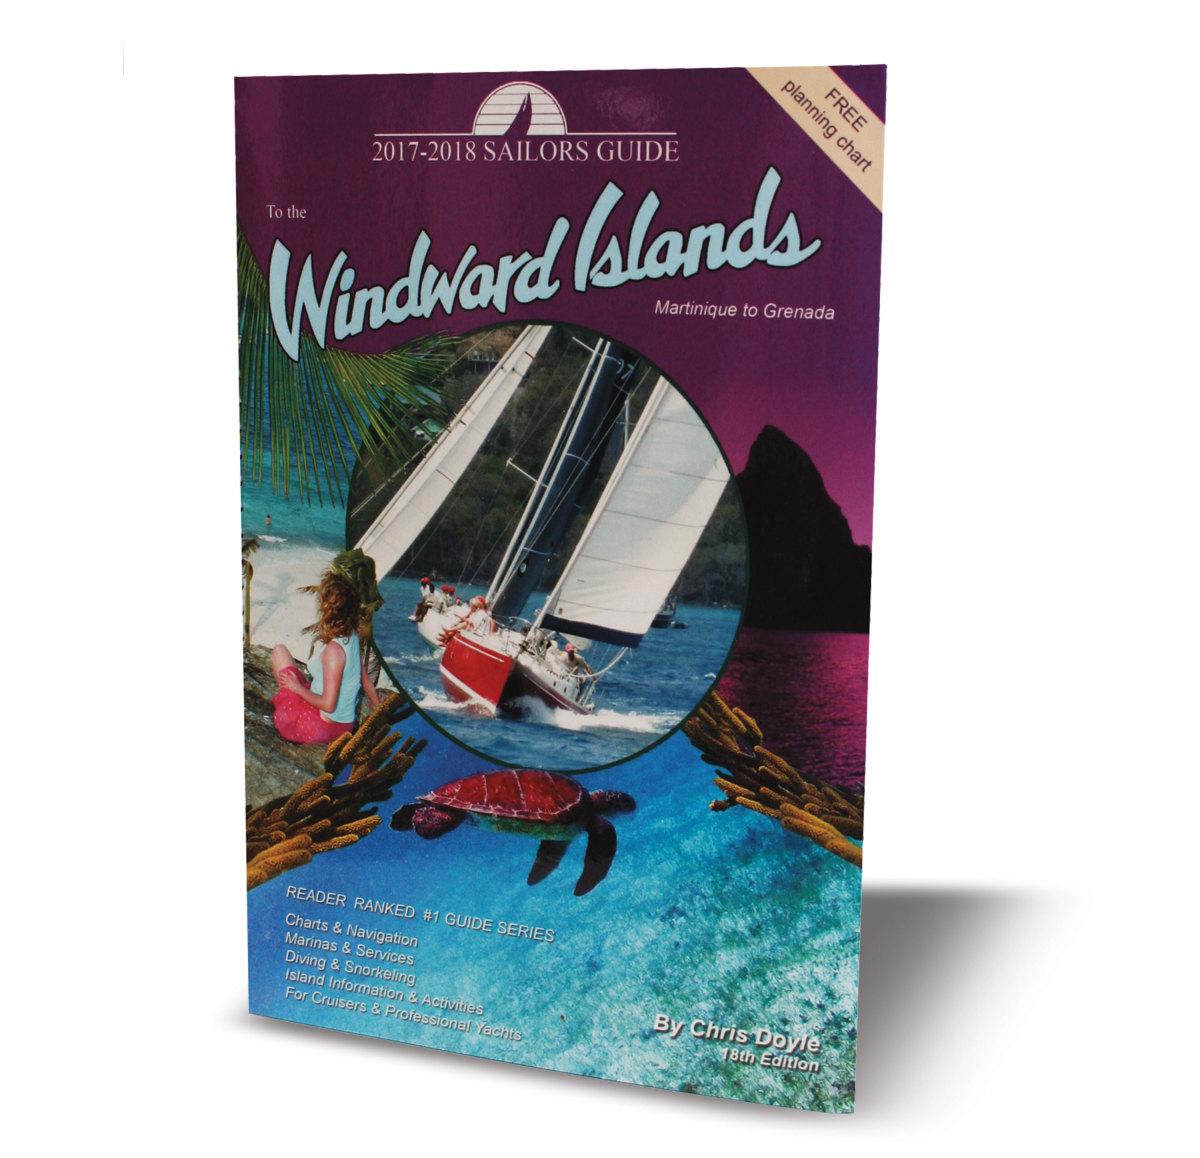 Windward Islands book cover